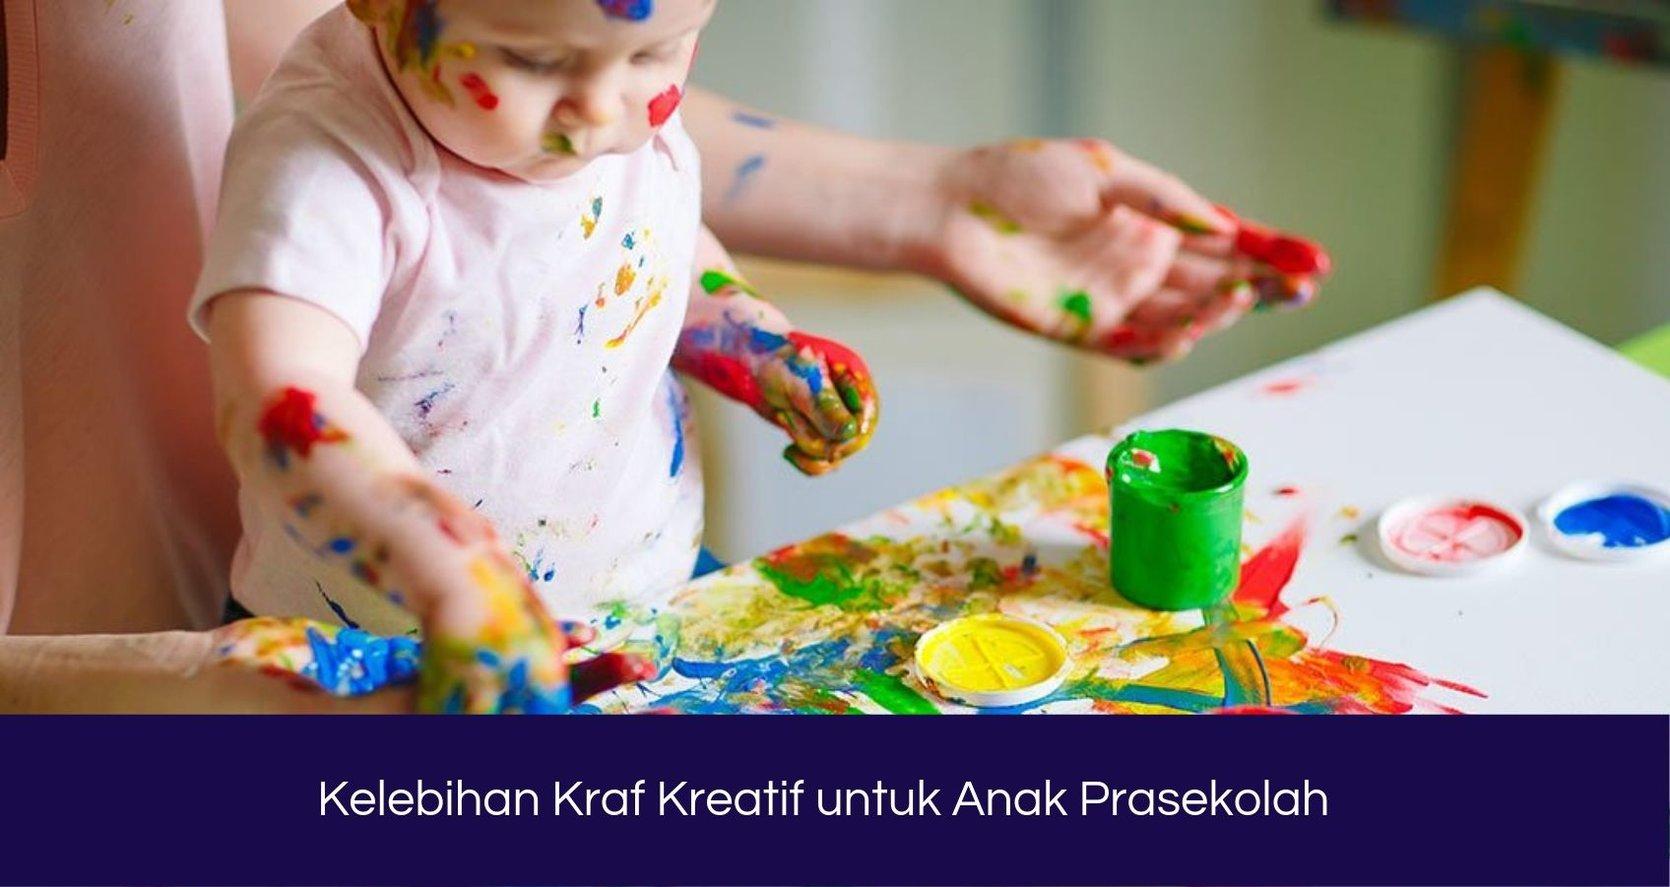 Kelebihan Kraf Kreatif untuk Anak Prasekolah